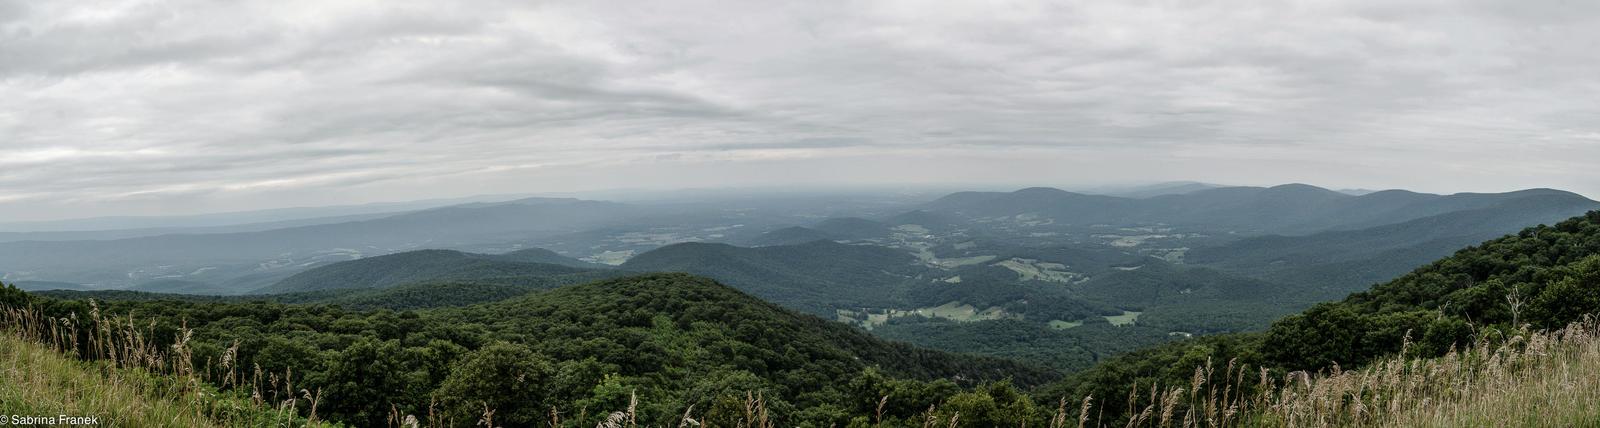 appalachian blue ridge mountains wallpaper - photo #37